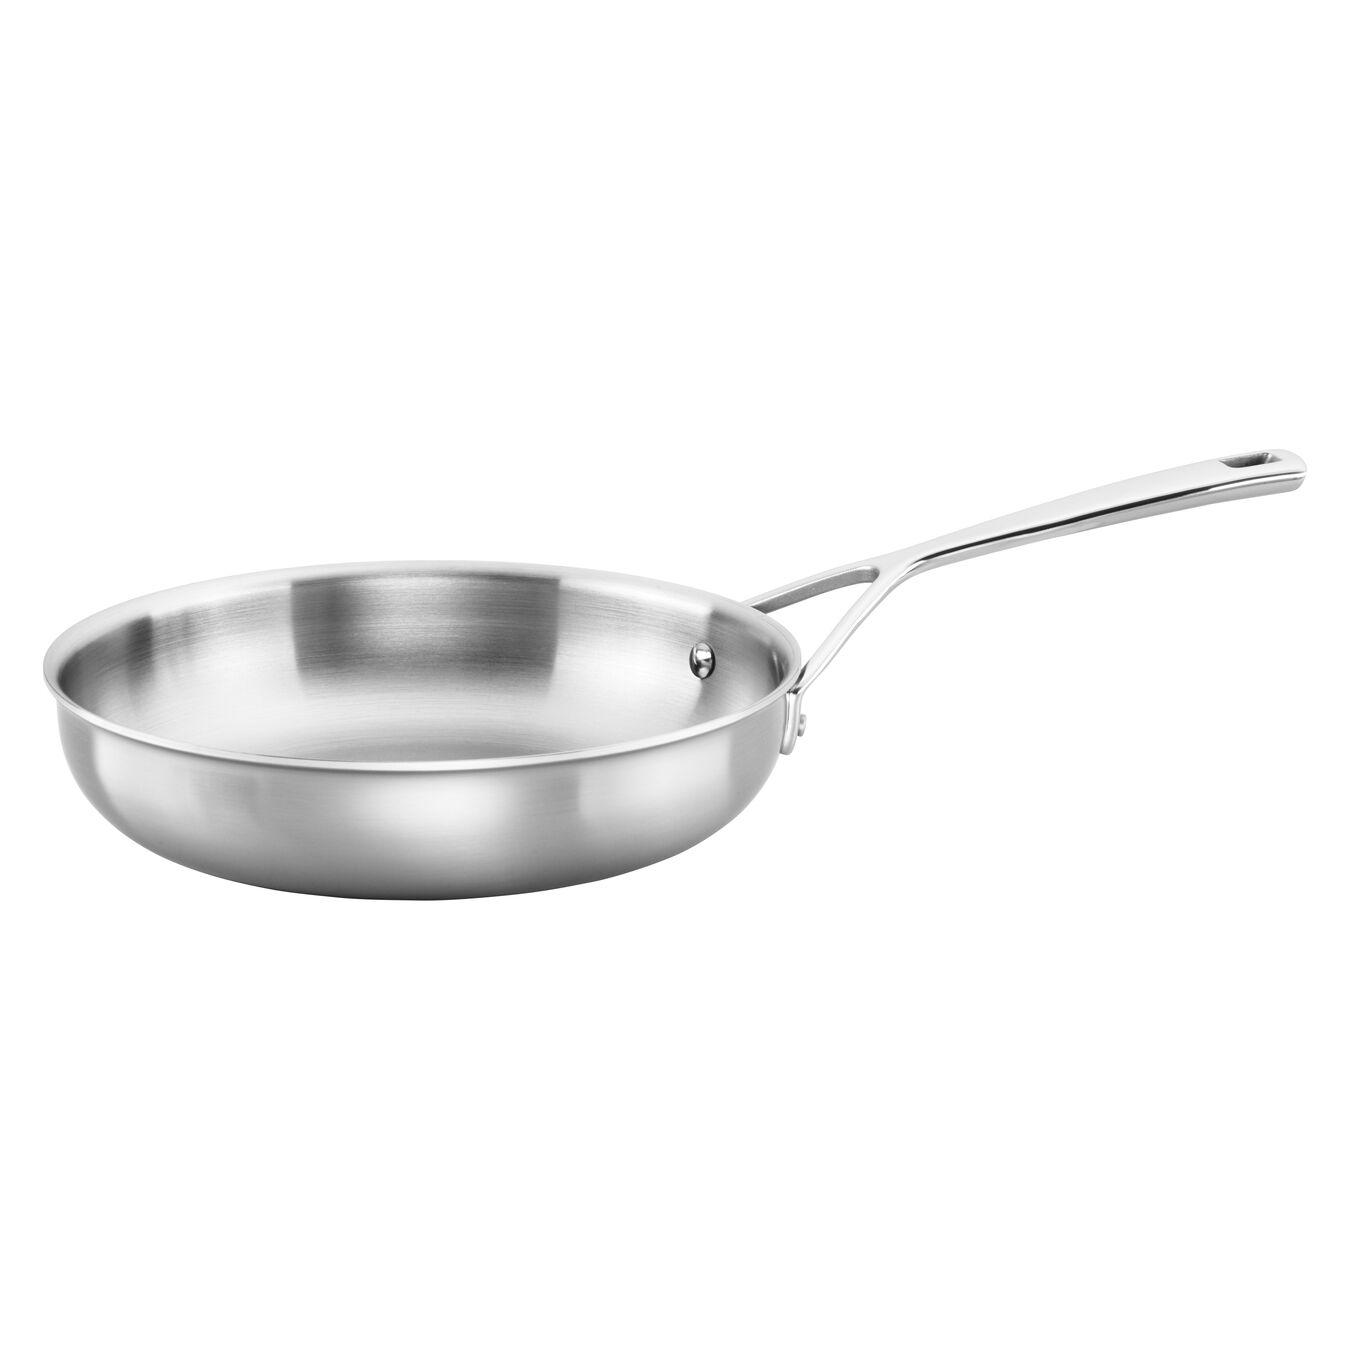 24 cm / 9.5 inch Frying pan,,large 2